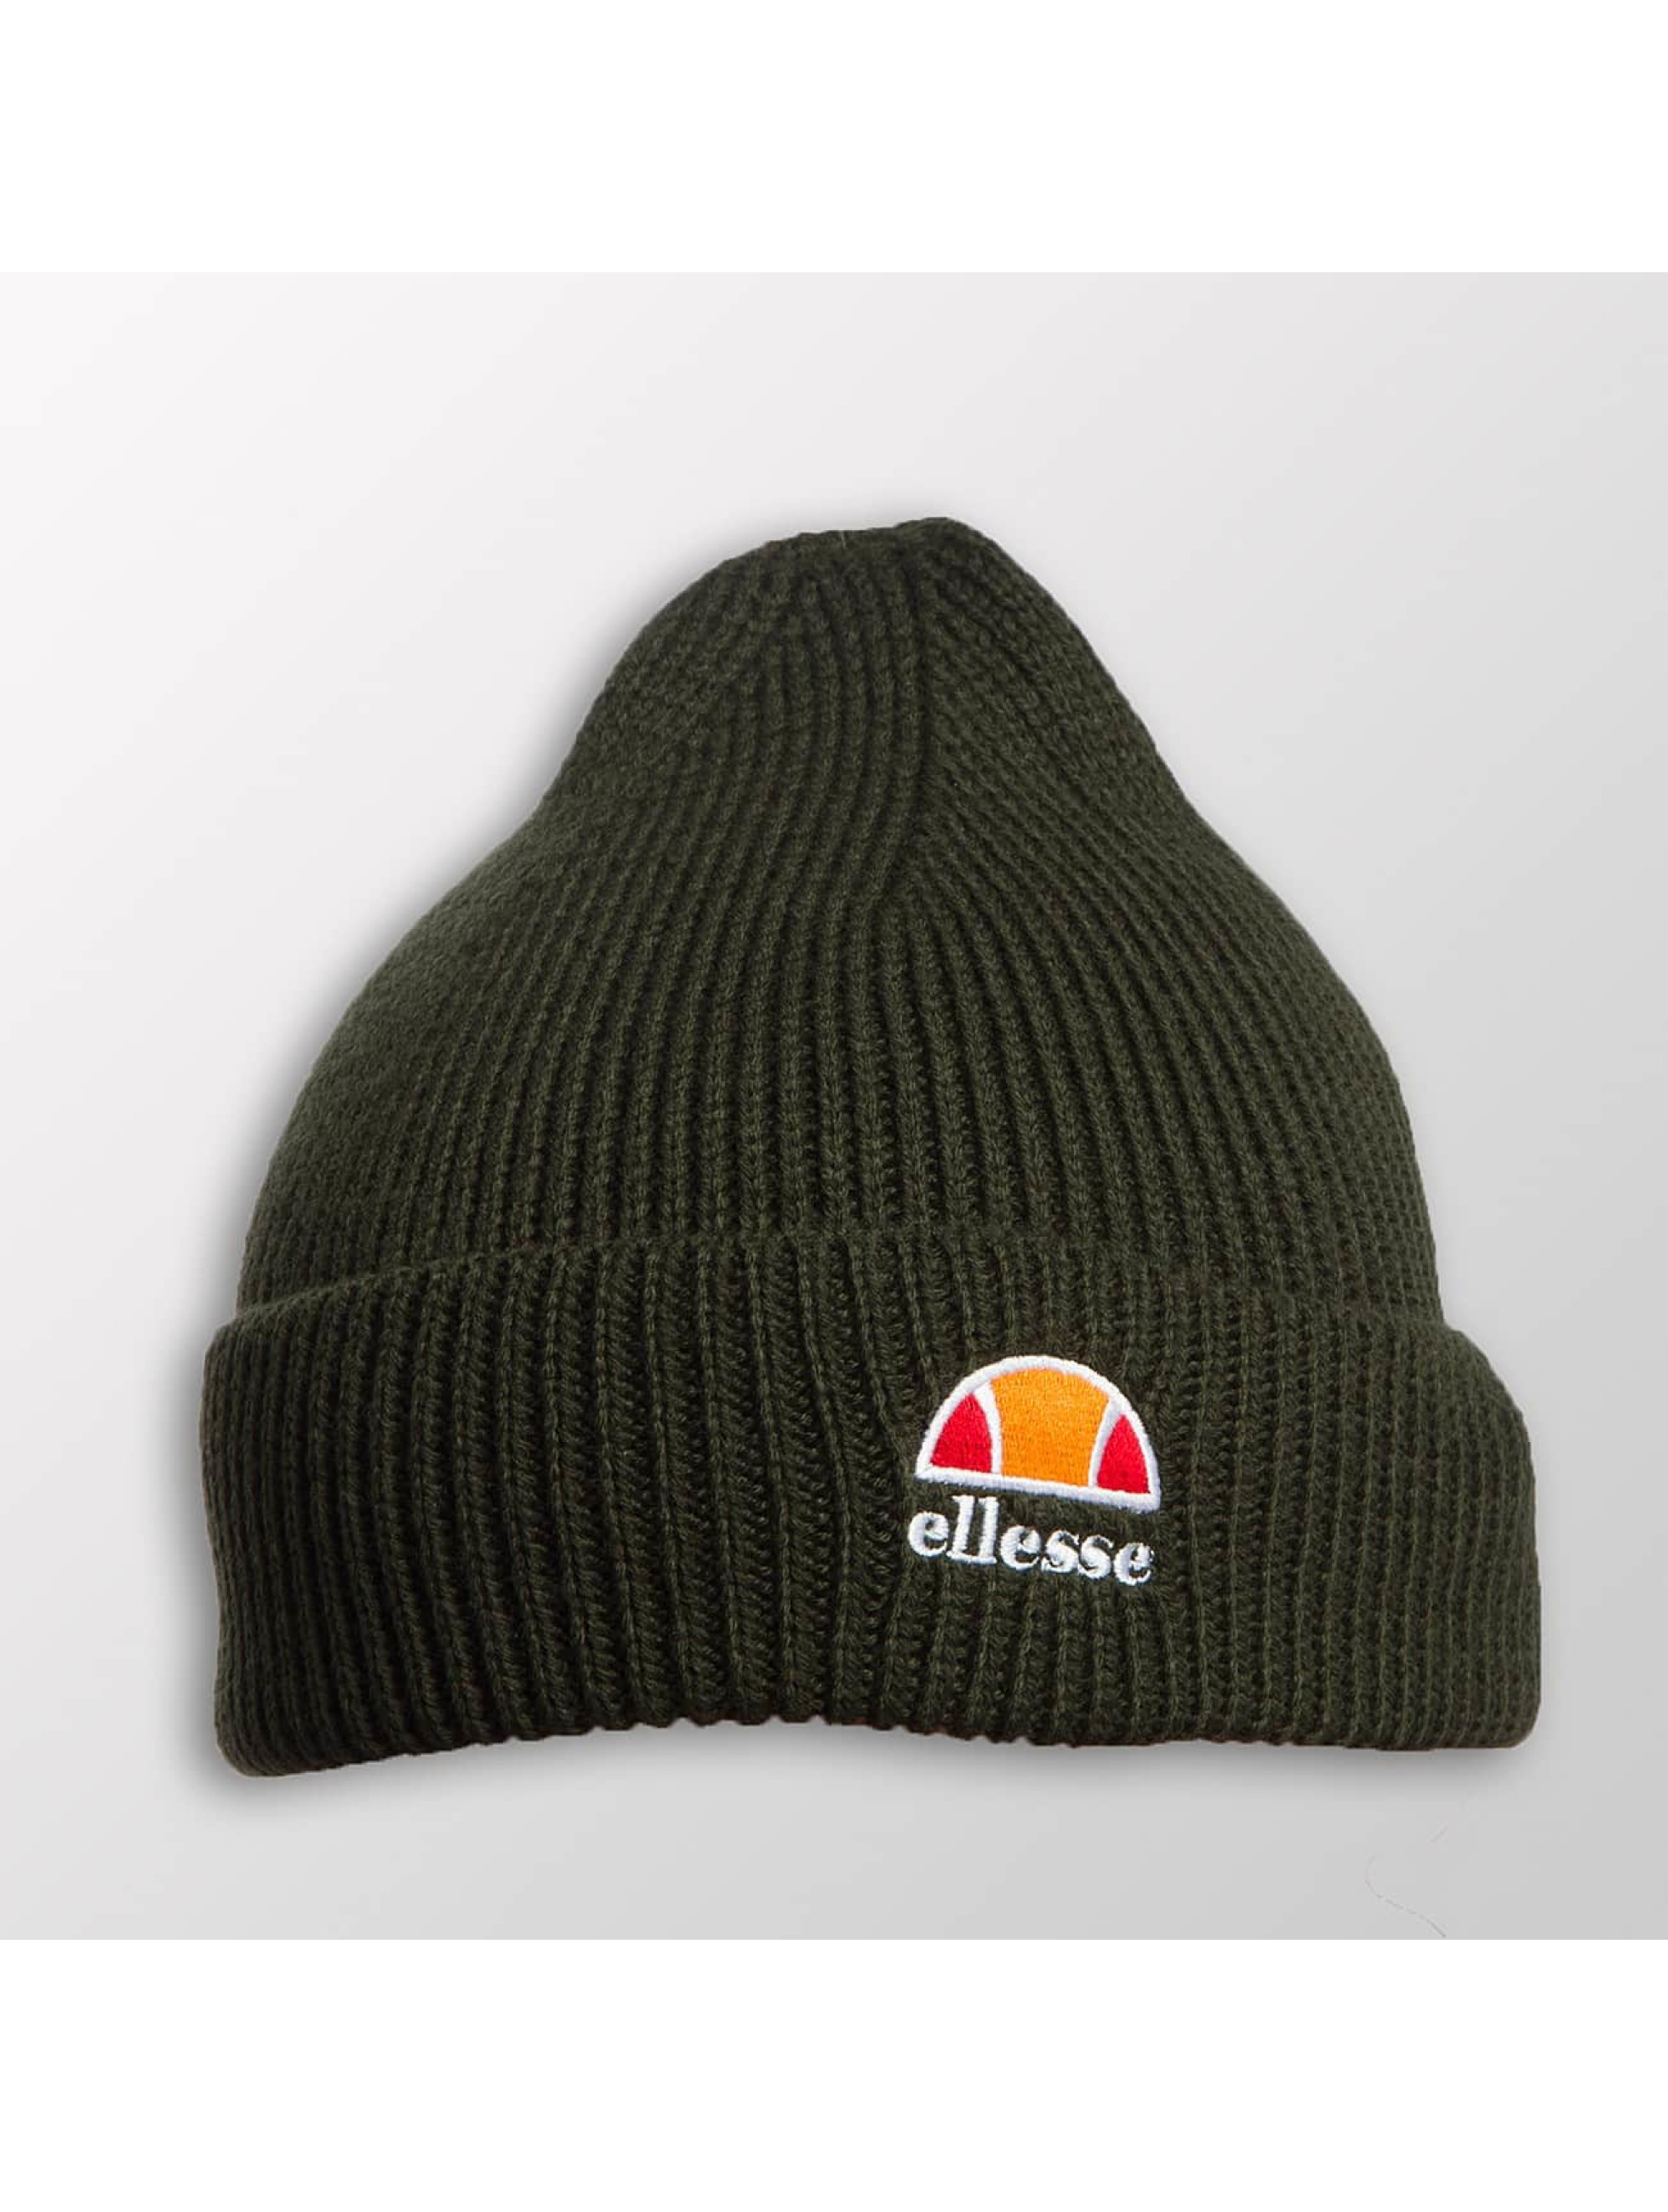 Ellesse Hat-1 Wicker olive